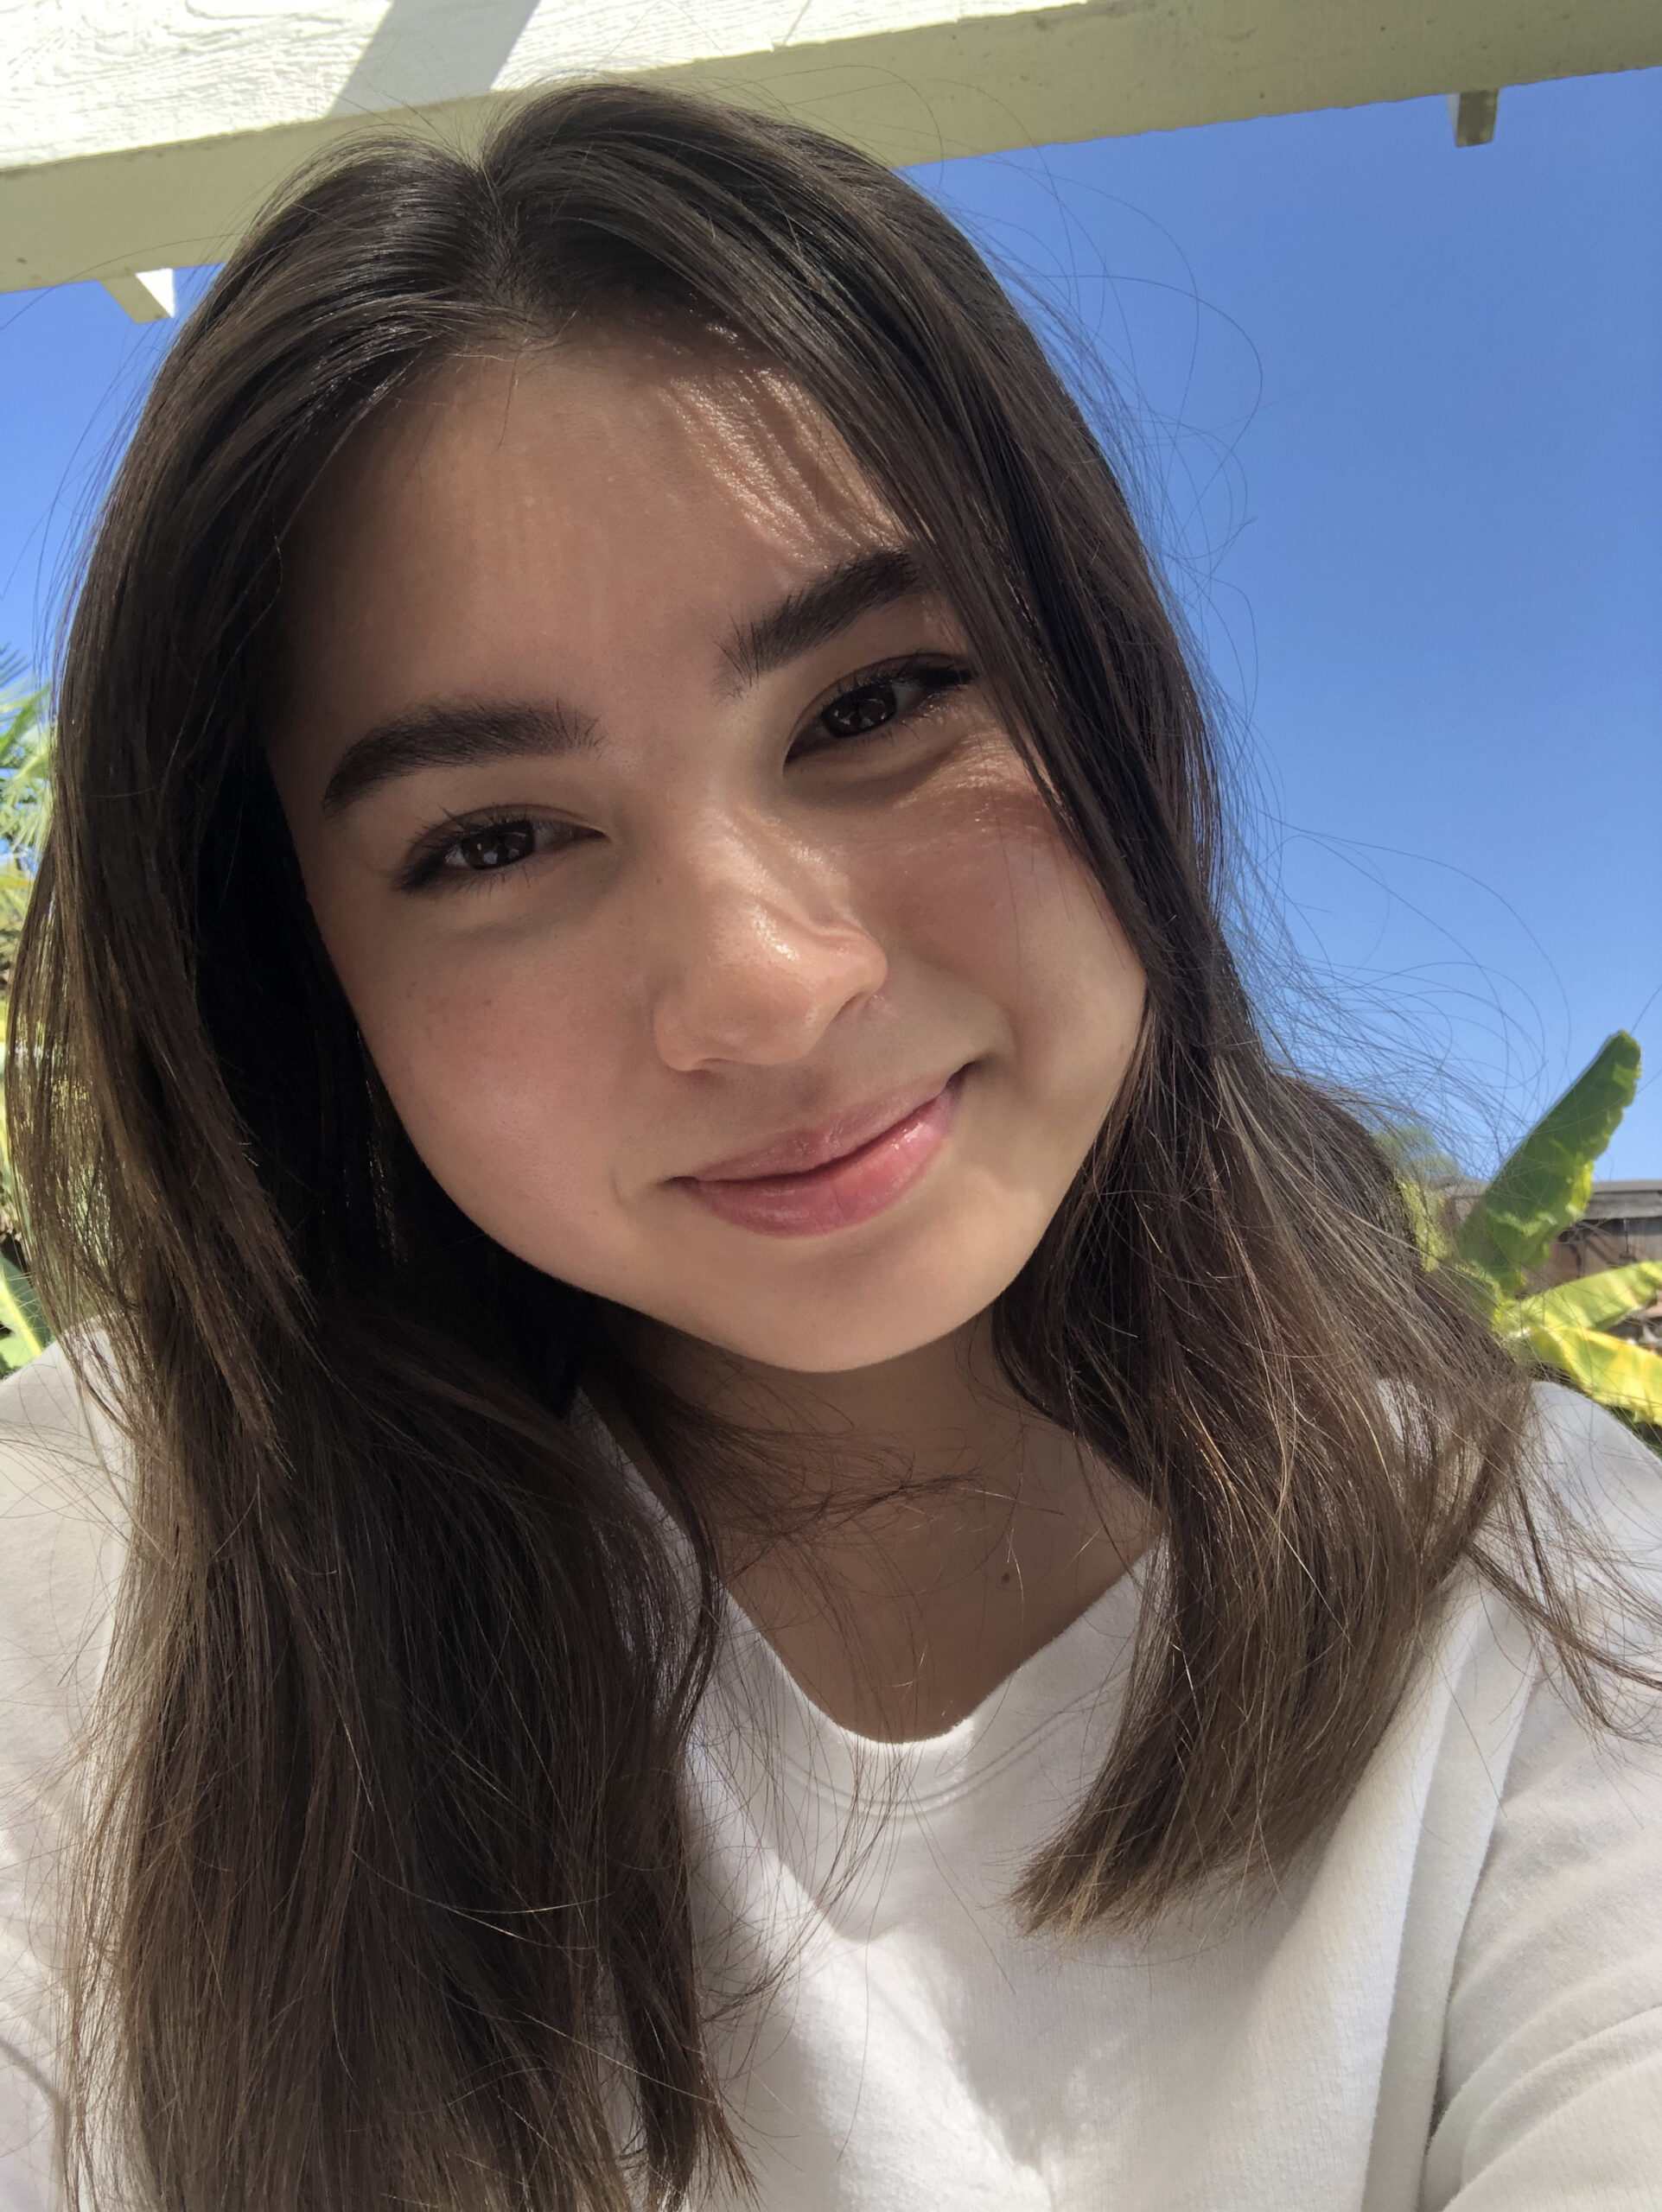 Bella Lastomirsky, Youth Volunteer